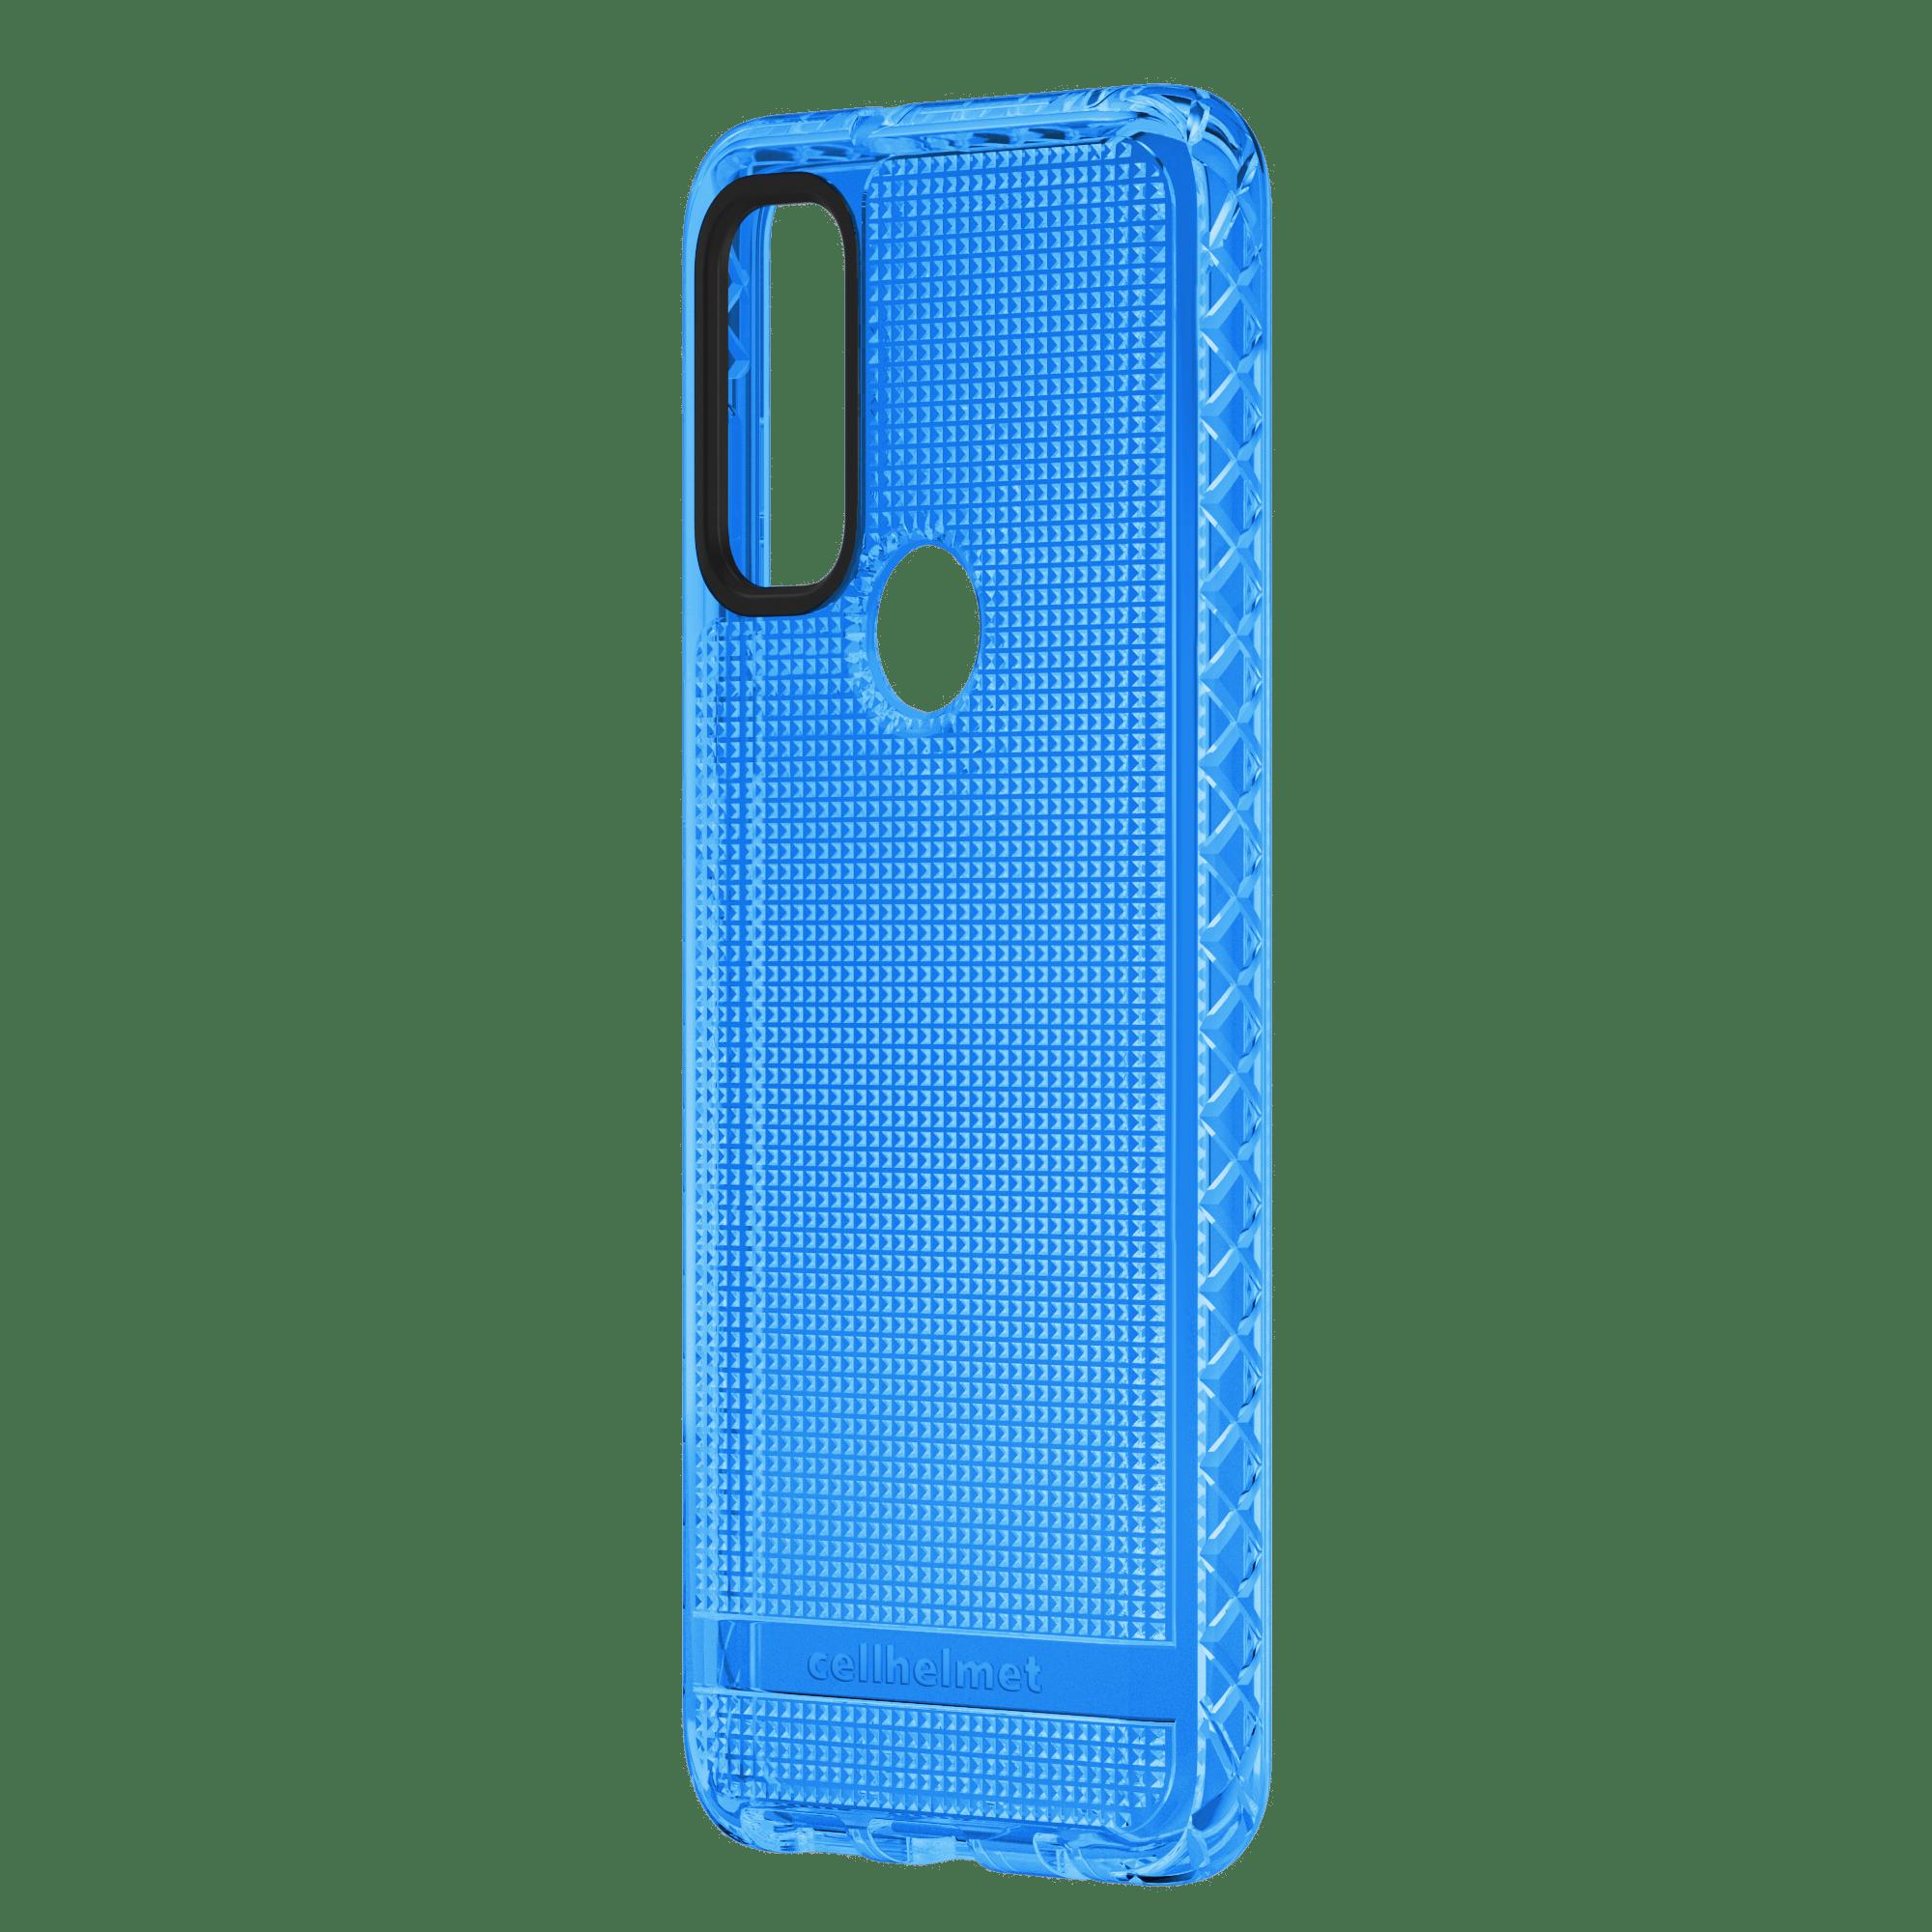 Cellhelmet Altitude X Series for moto g pure-Blue